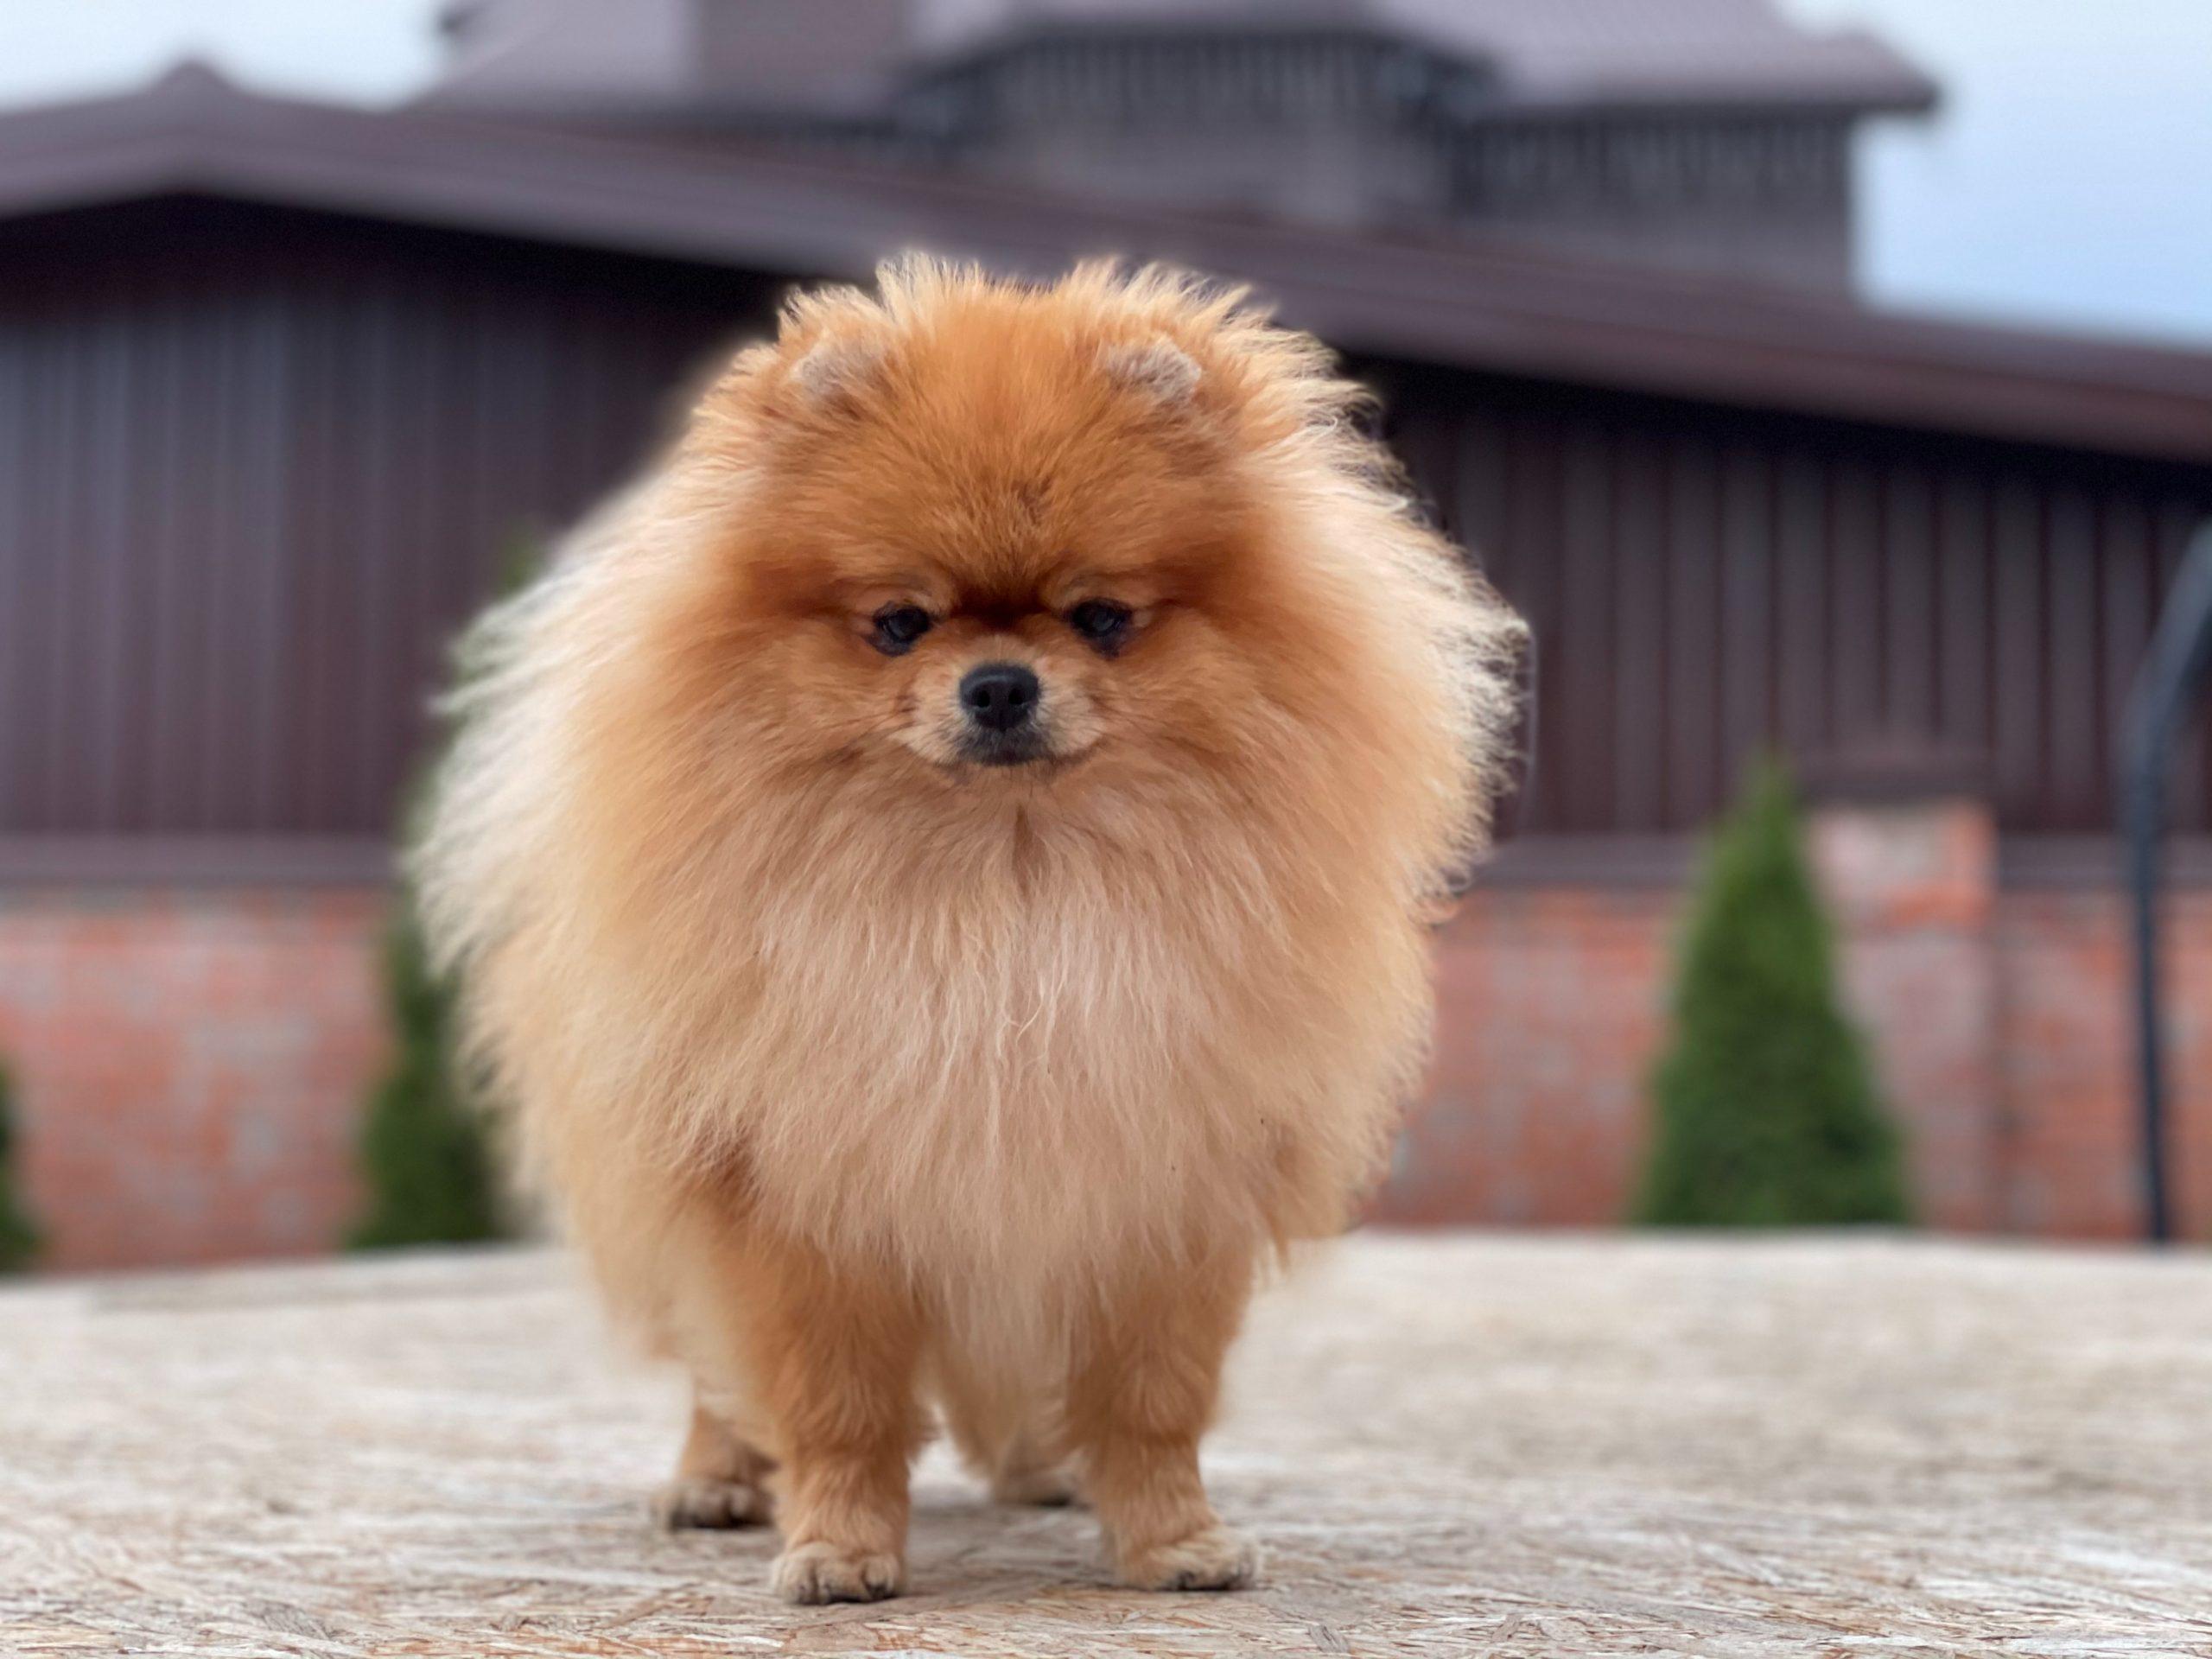 16 Dogs That Look Like Lions - Pomeranian